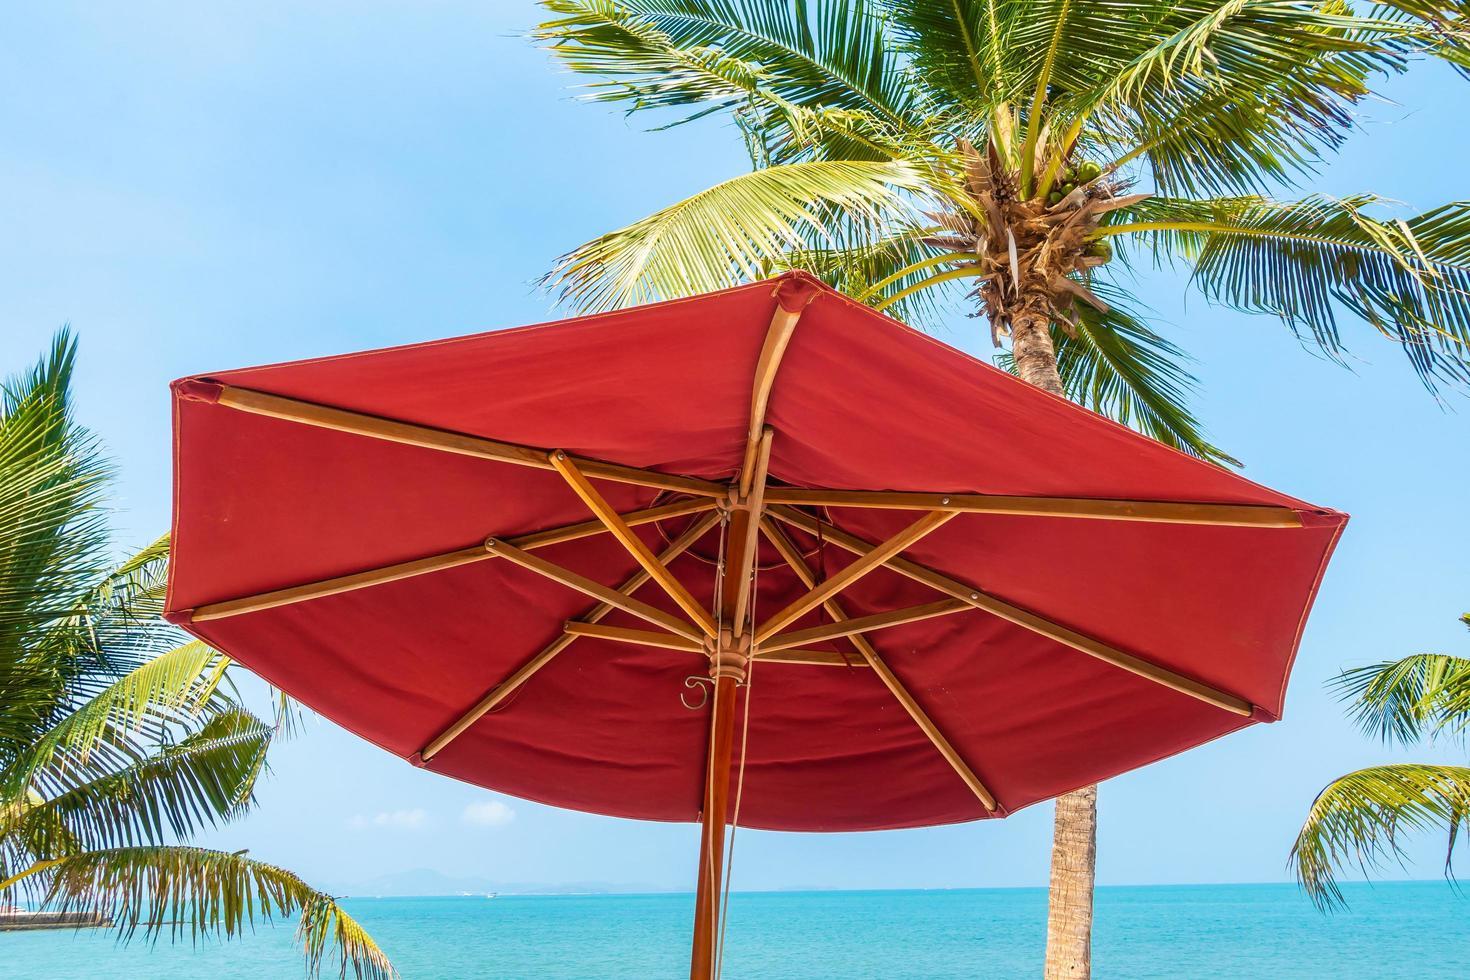 Regenschirm am Strand foto